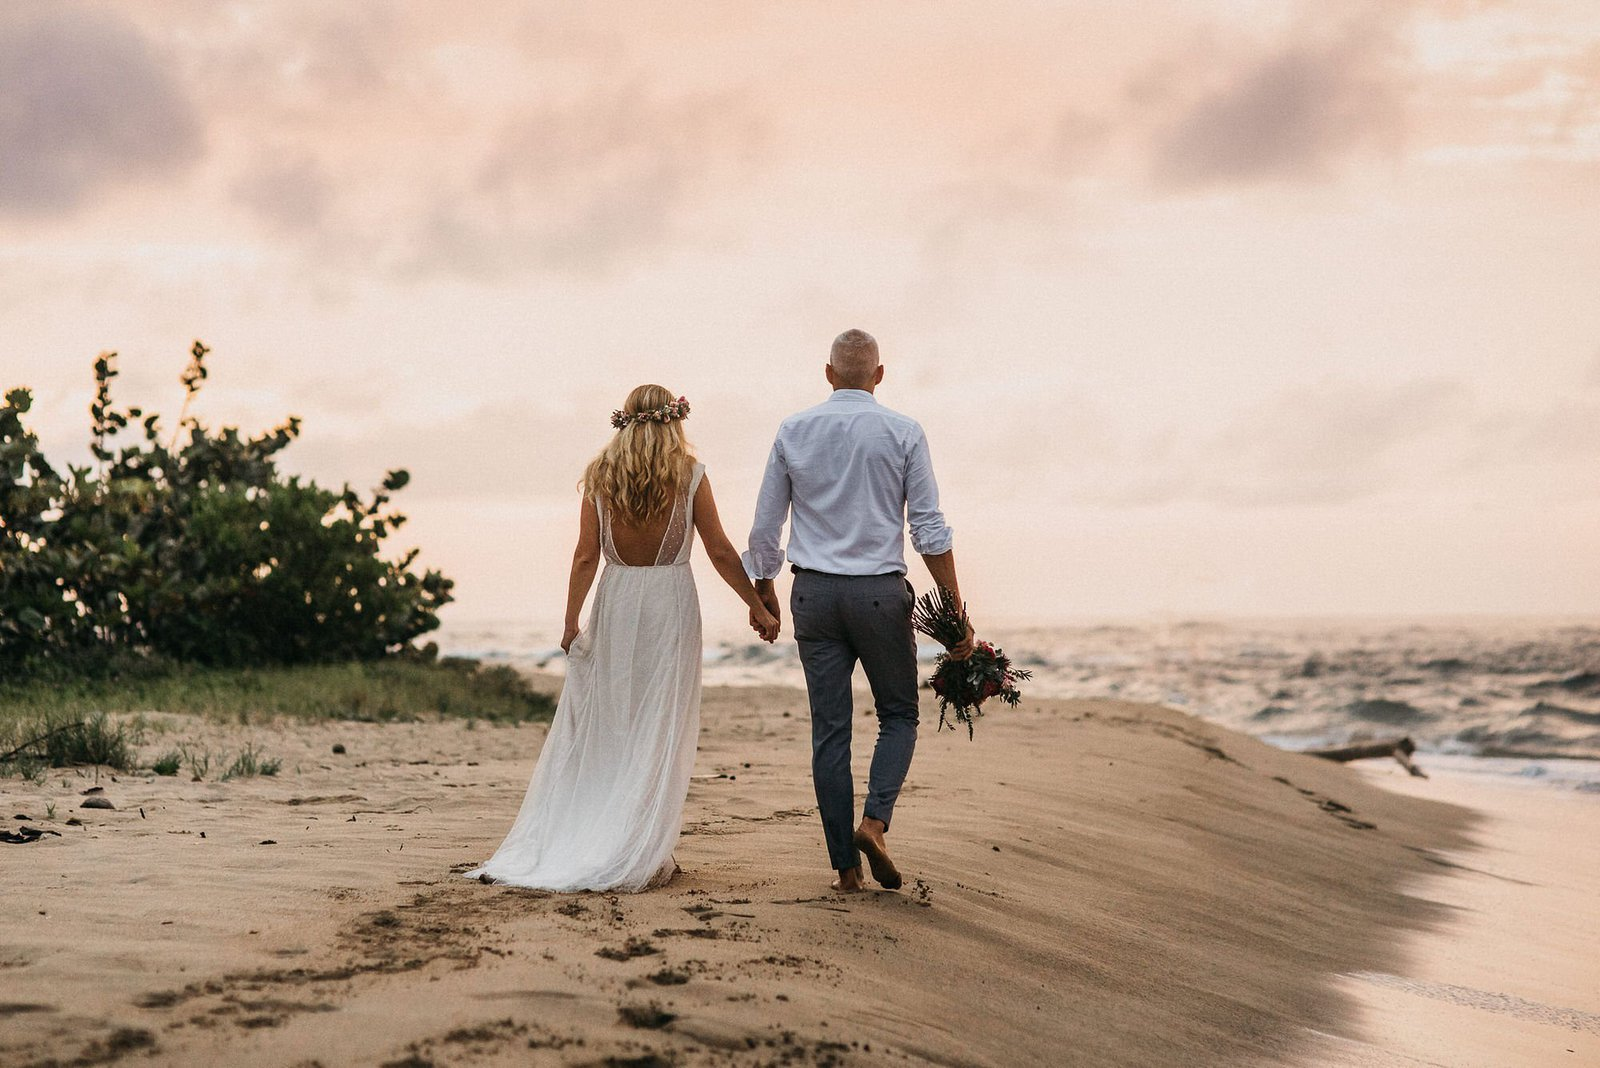 husband and wife walking on beach.